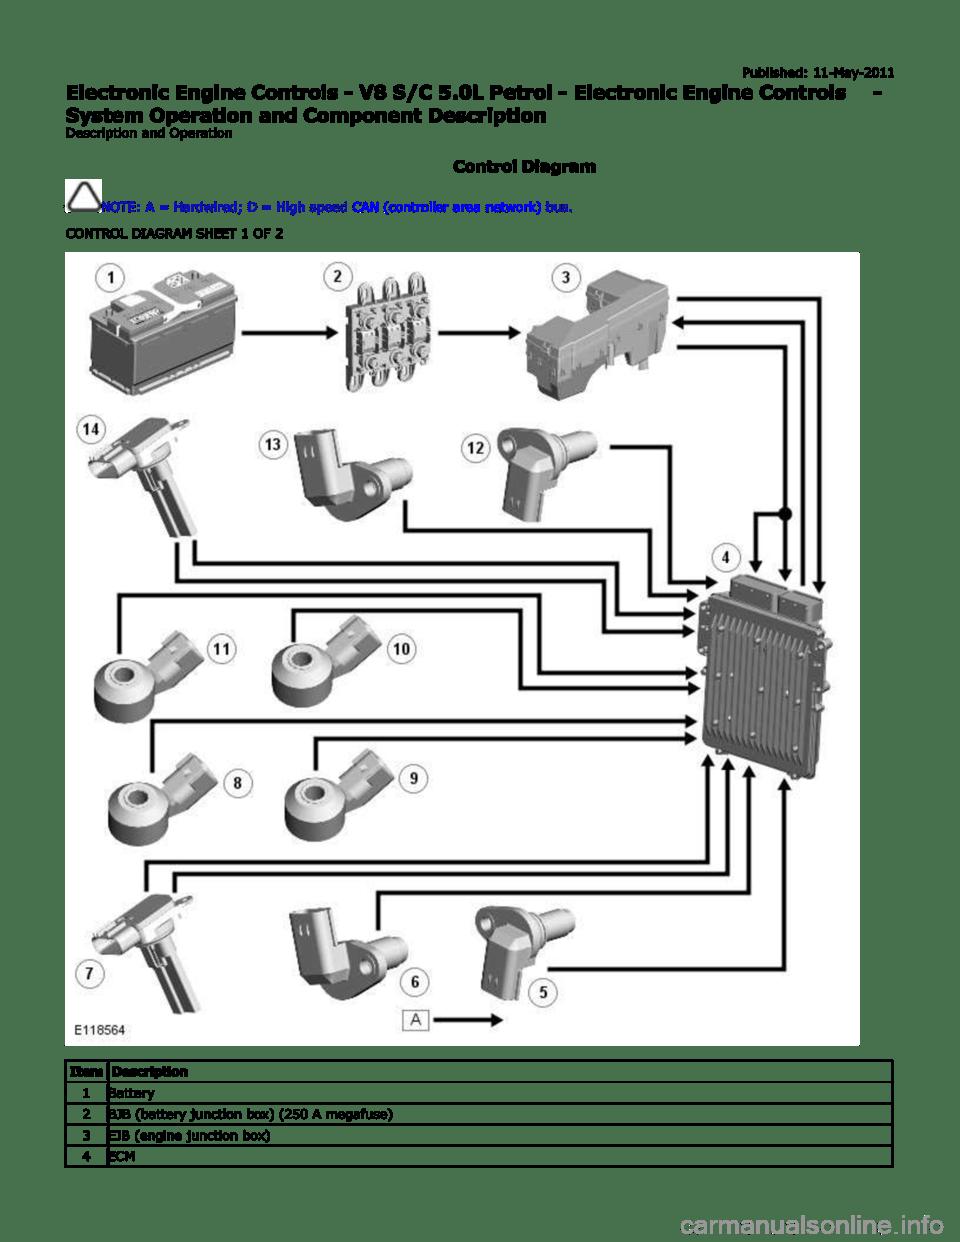 hight resolution of 2010 jaguar xfr engine diagram